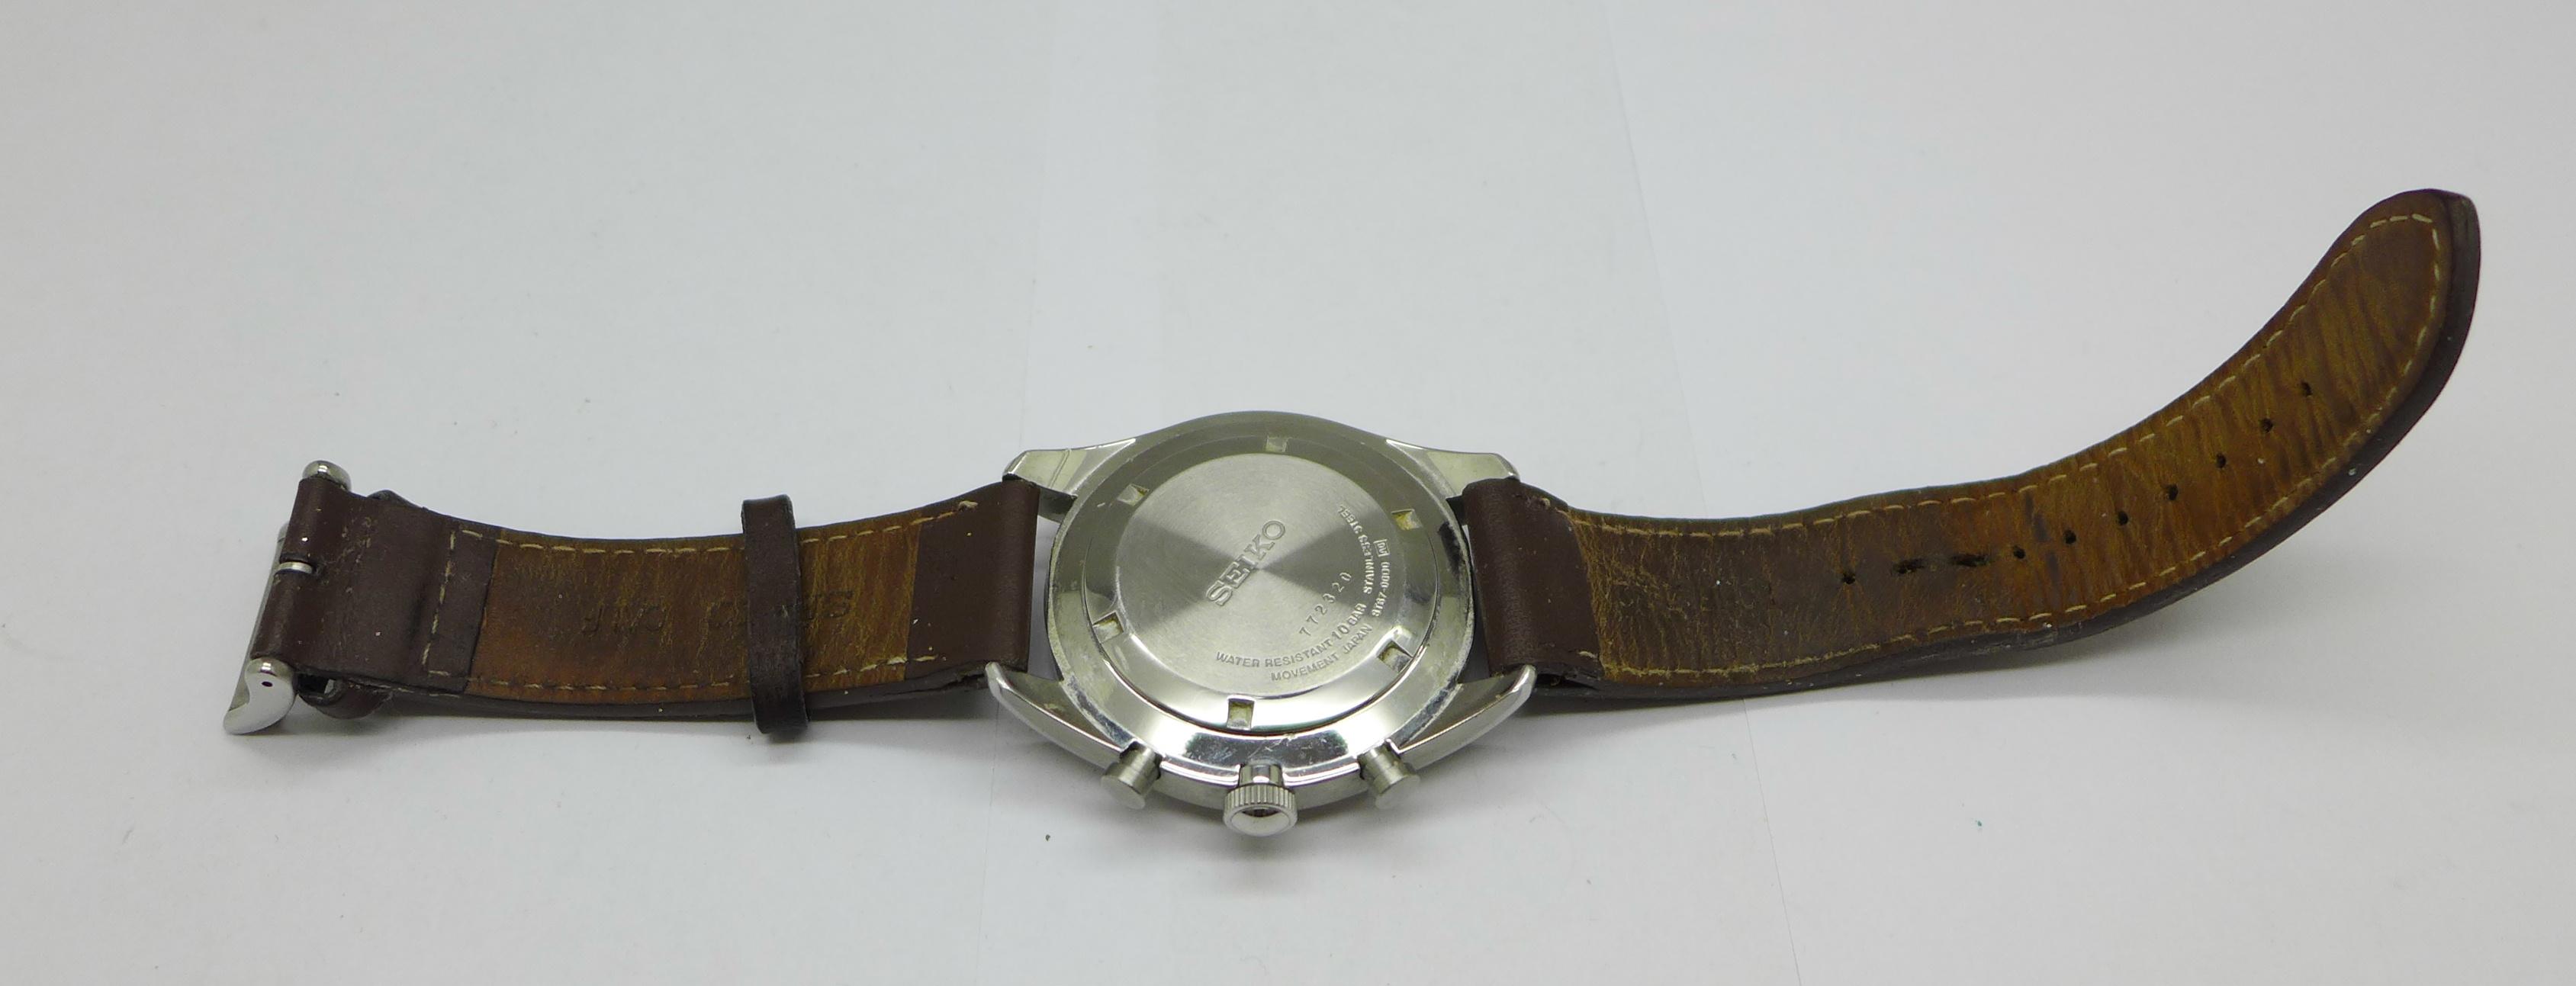 A Seiko chronograph wristwatch - Image 6 of 6